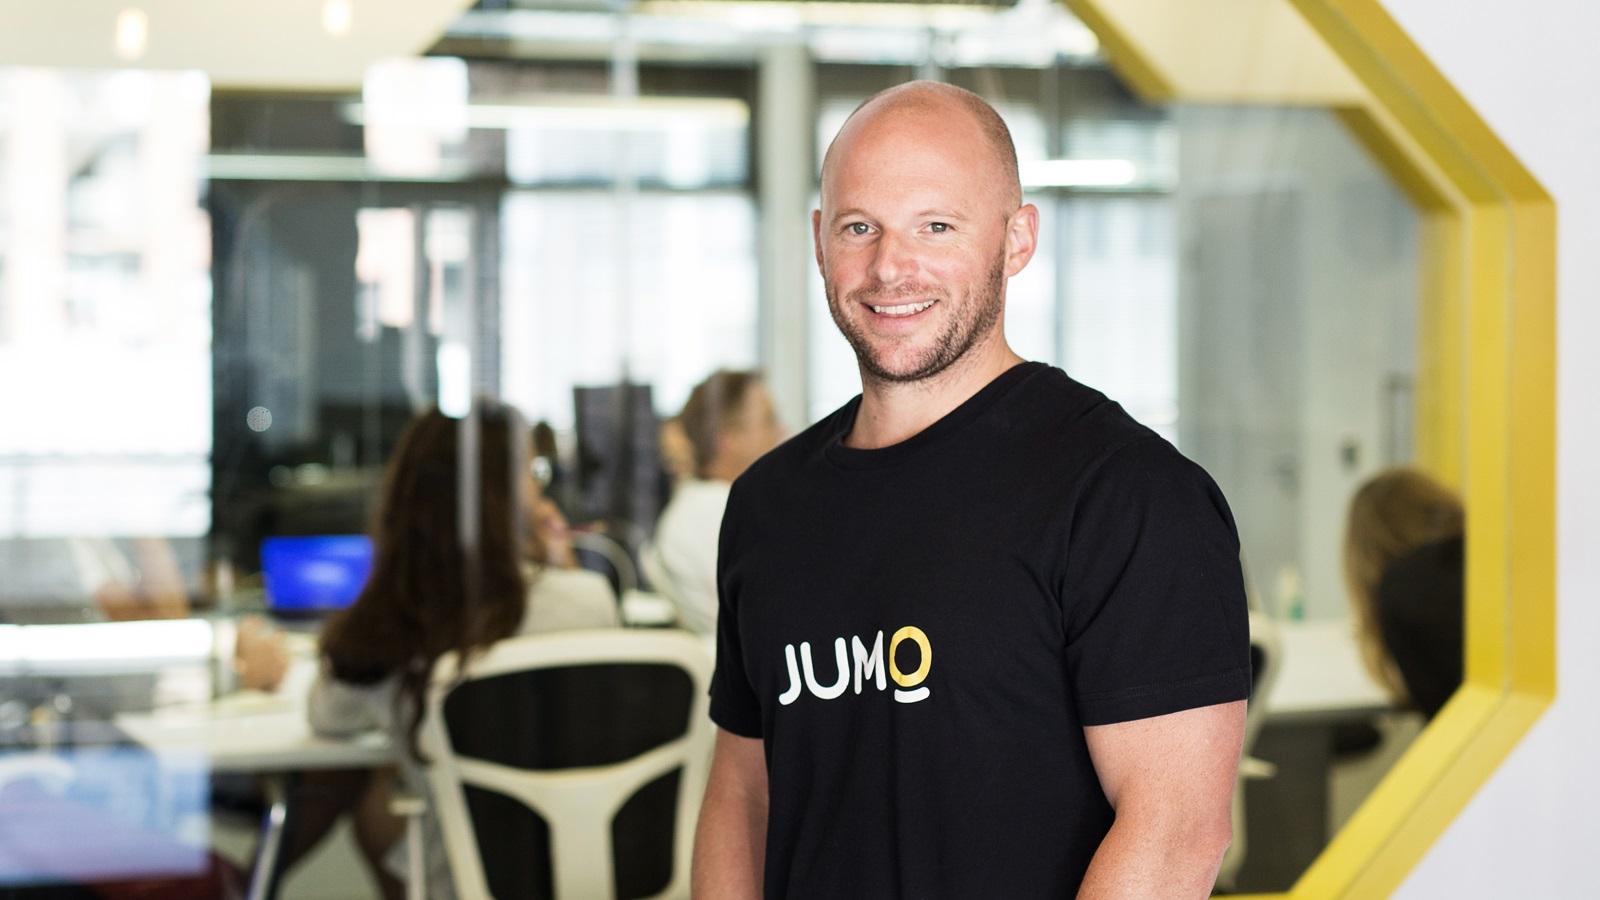 TechCabal Daily - South Africa's JUMO raises $55 million funding